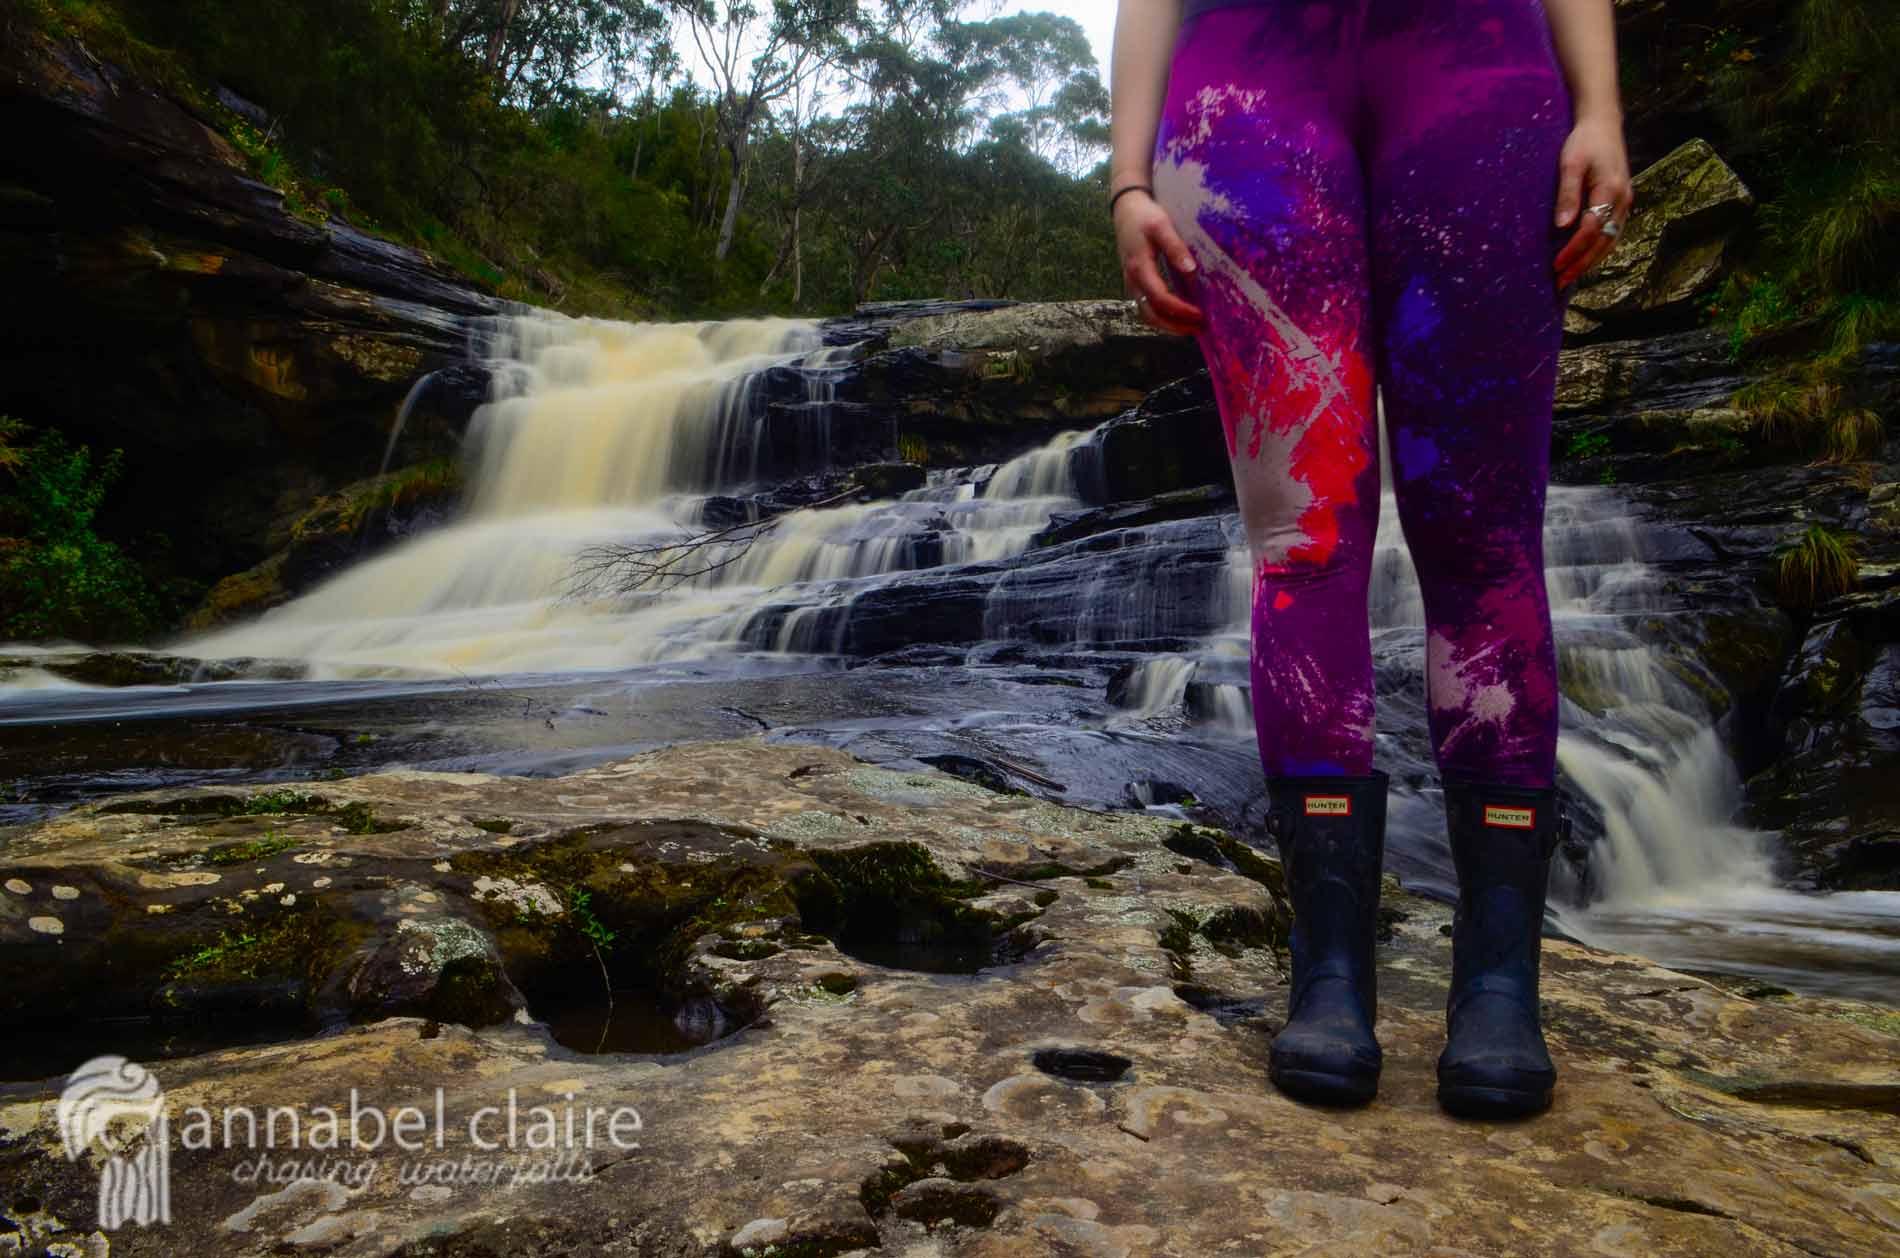 Chasing Waterfalls wearing Nike leggings and Hunter Boots at Swallow Cave Falls